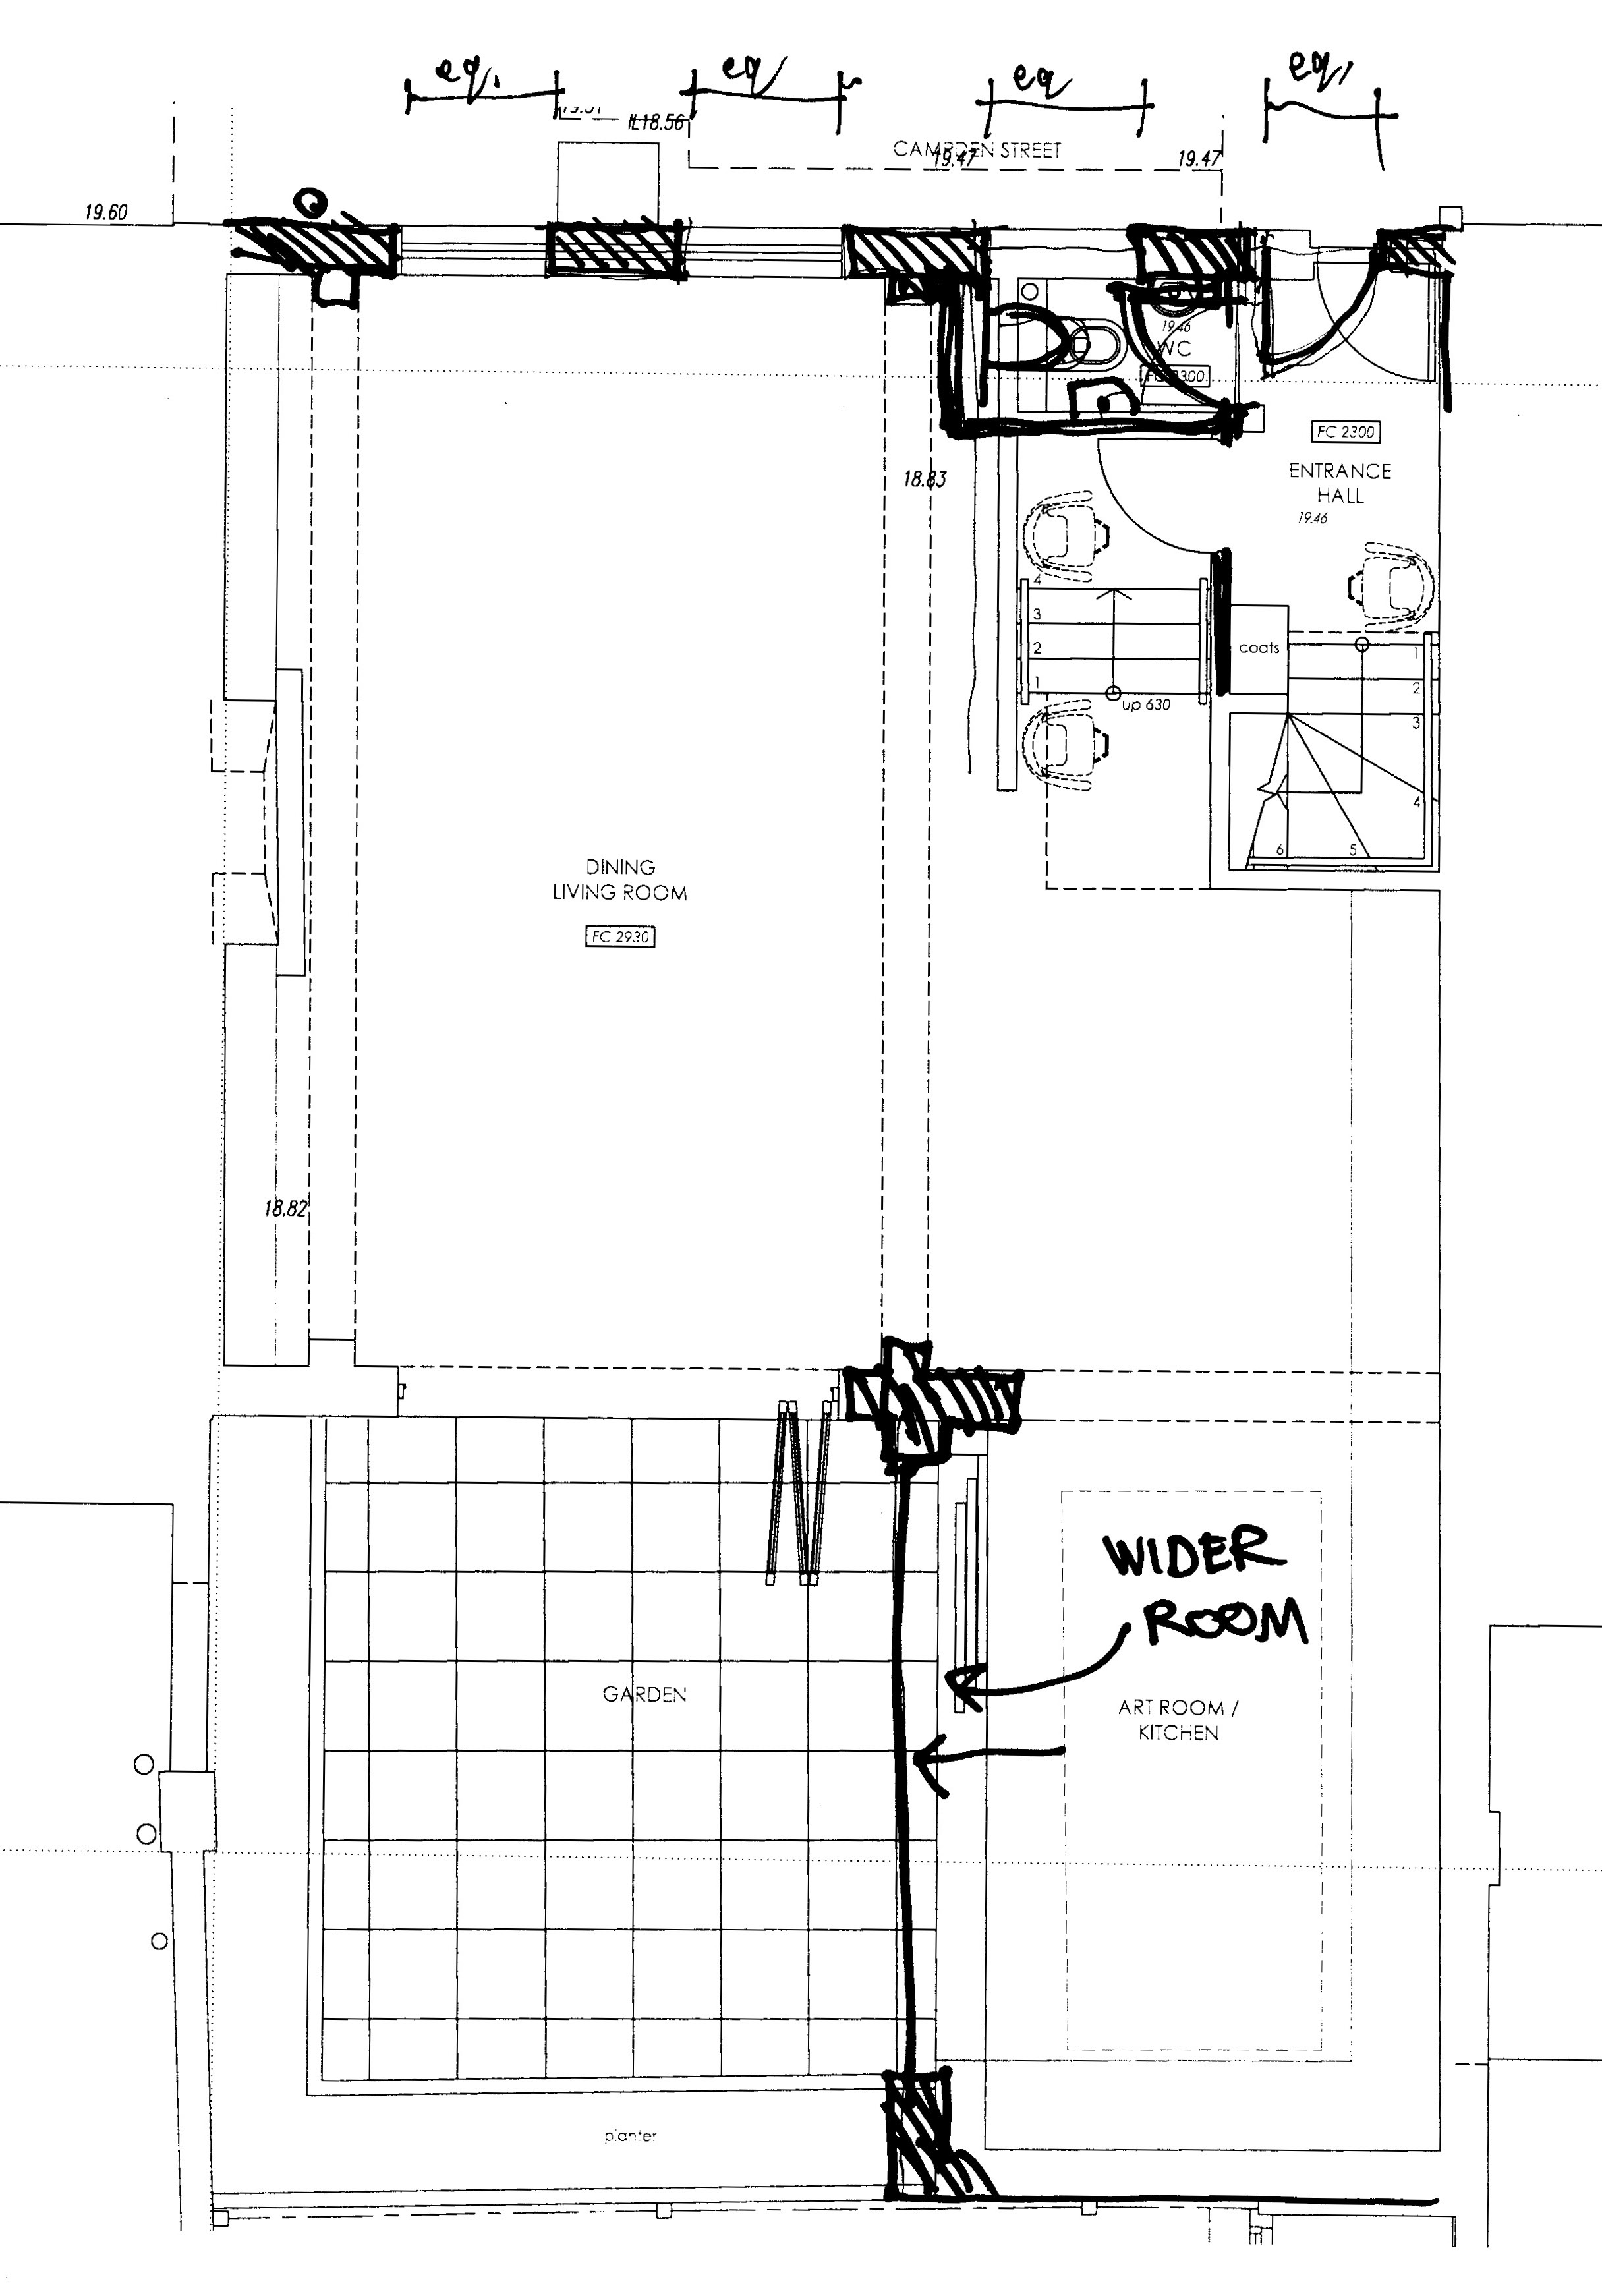 FINEarchitecture_CampdenStreet_Sketch2.jpg